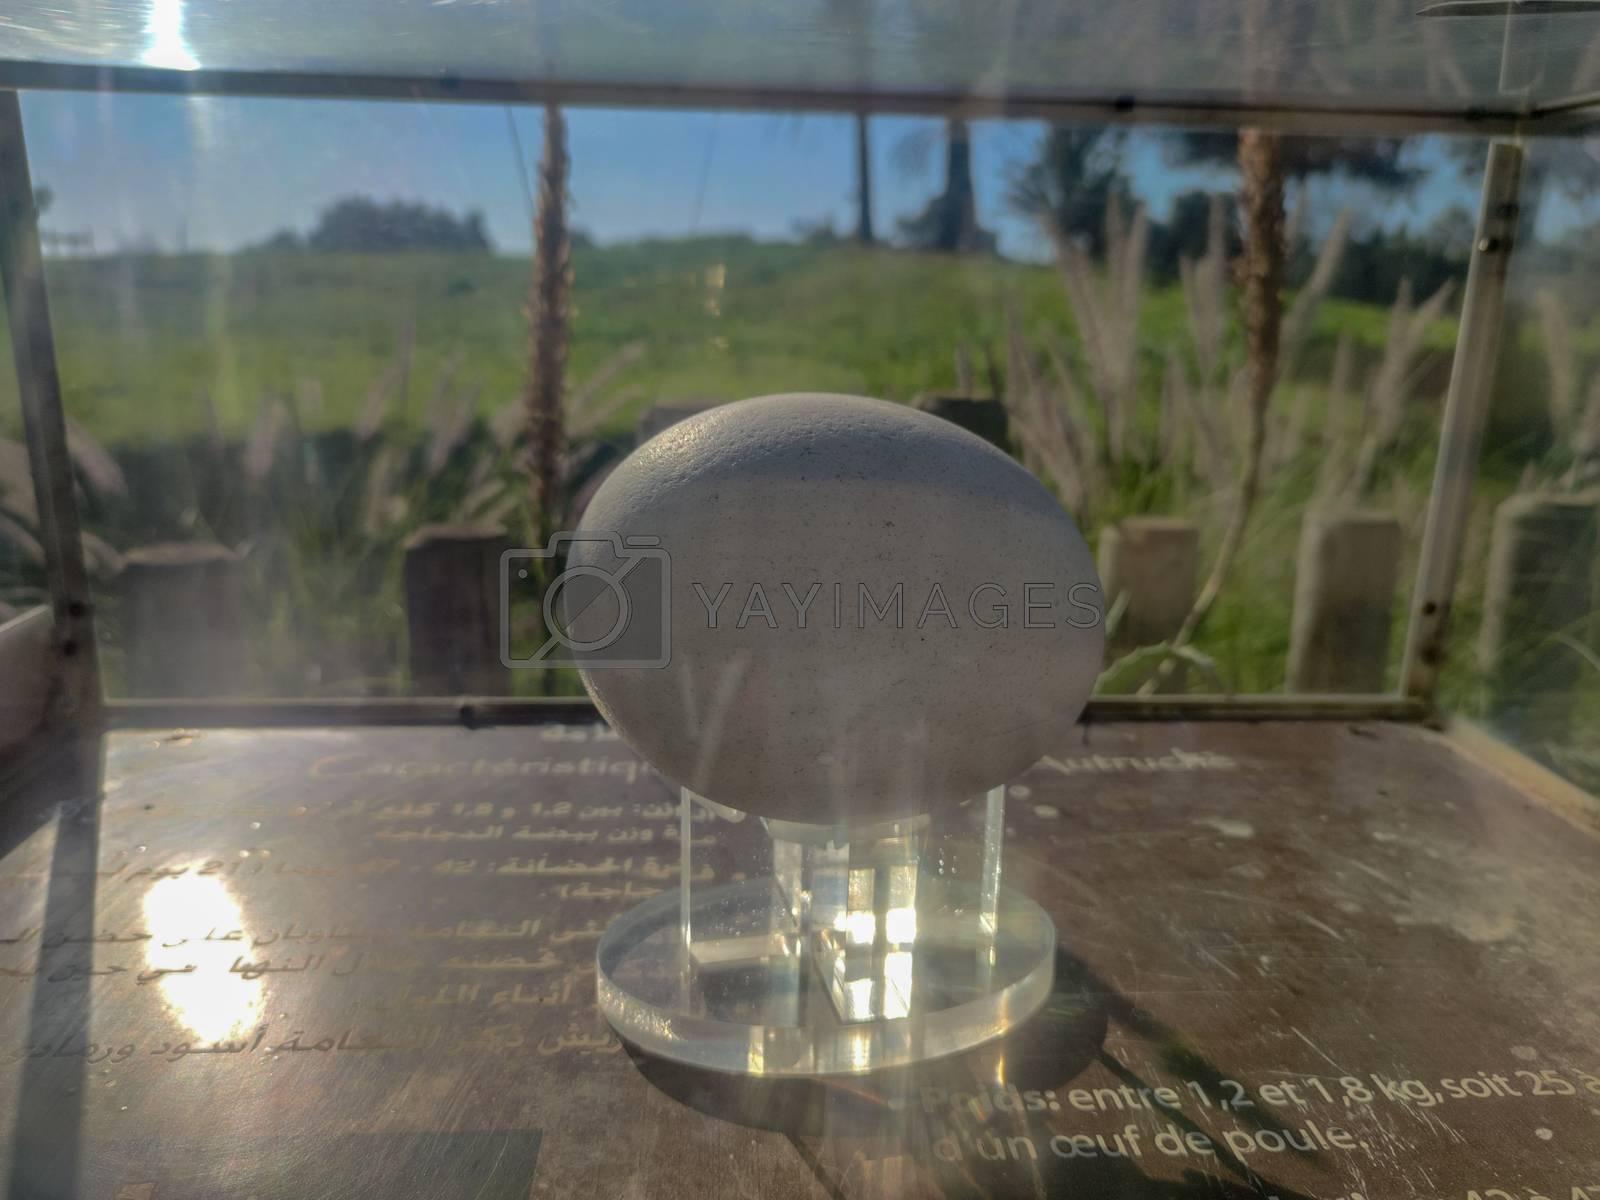 An ostrich egg in a glass box